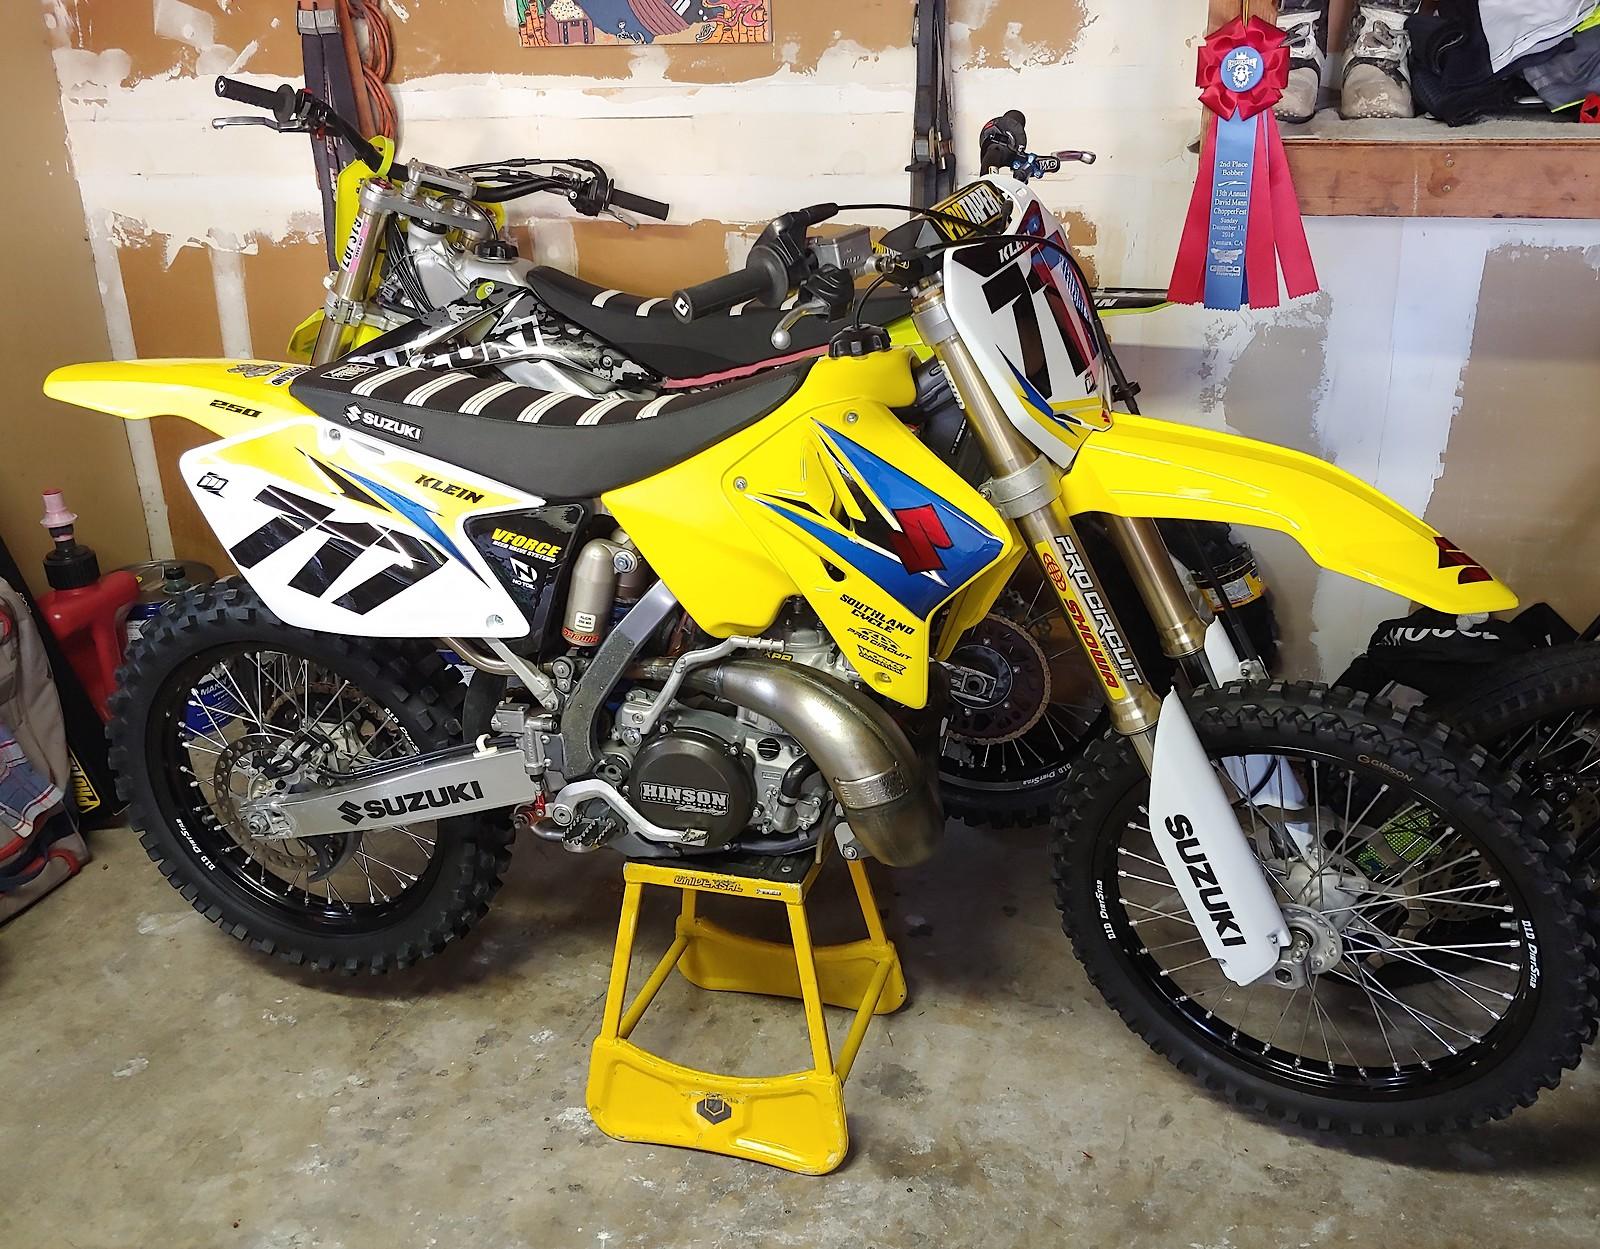 3CCF451D-9BAB-4095-AA4E-D4EC2145E716 - Kleinmotorsports - Motocross Pictures - Vital MX